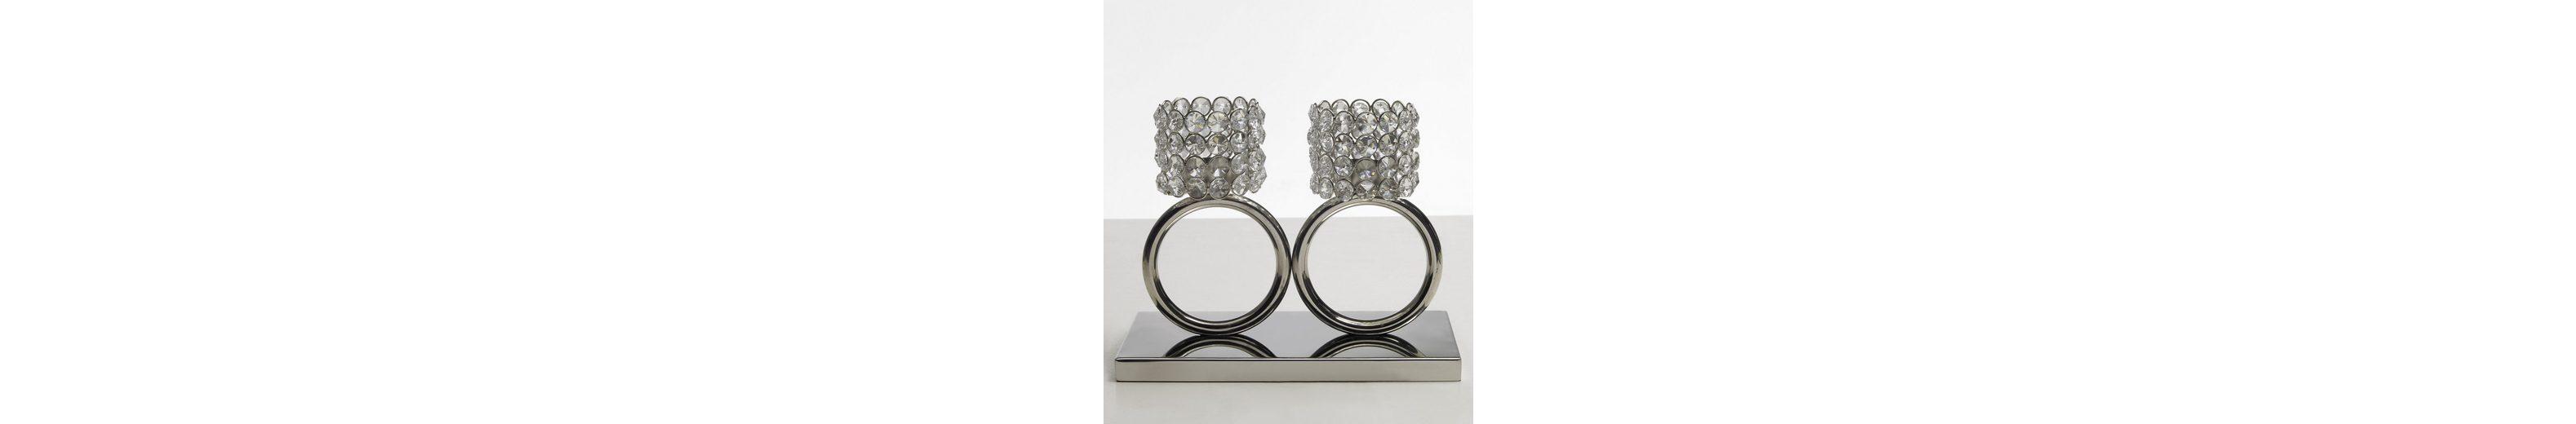 Premium collection by Home affaire Teelichthalter »Kristall«